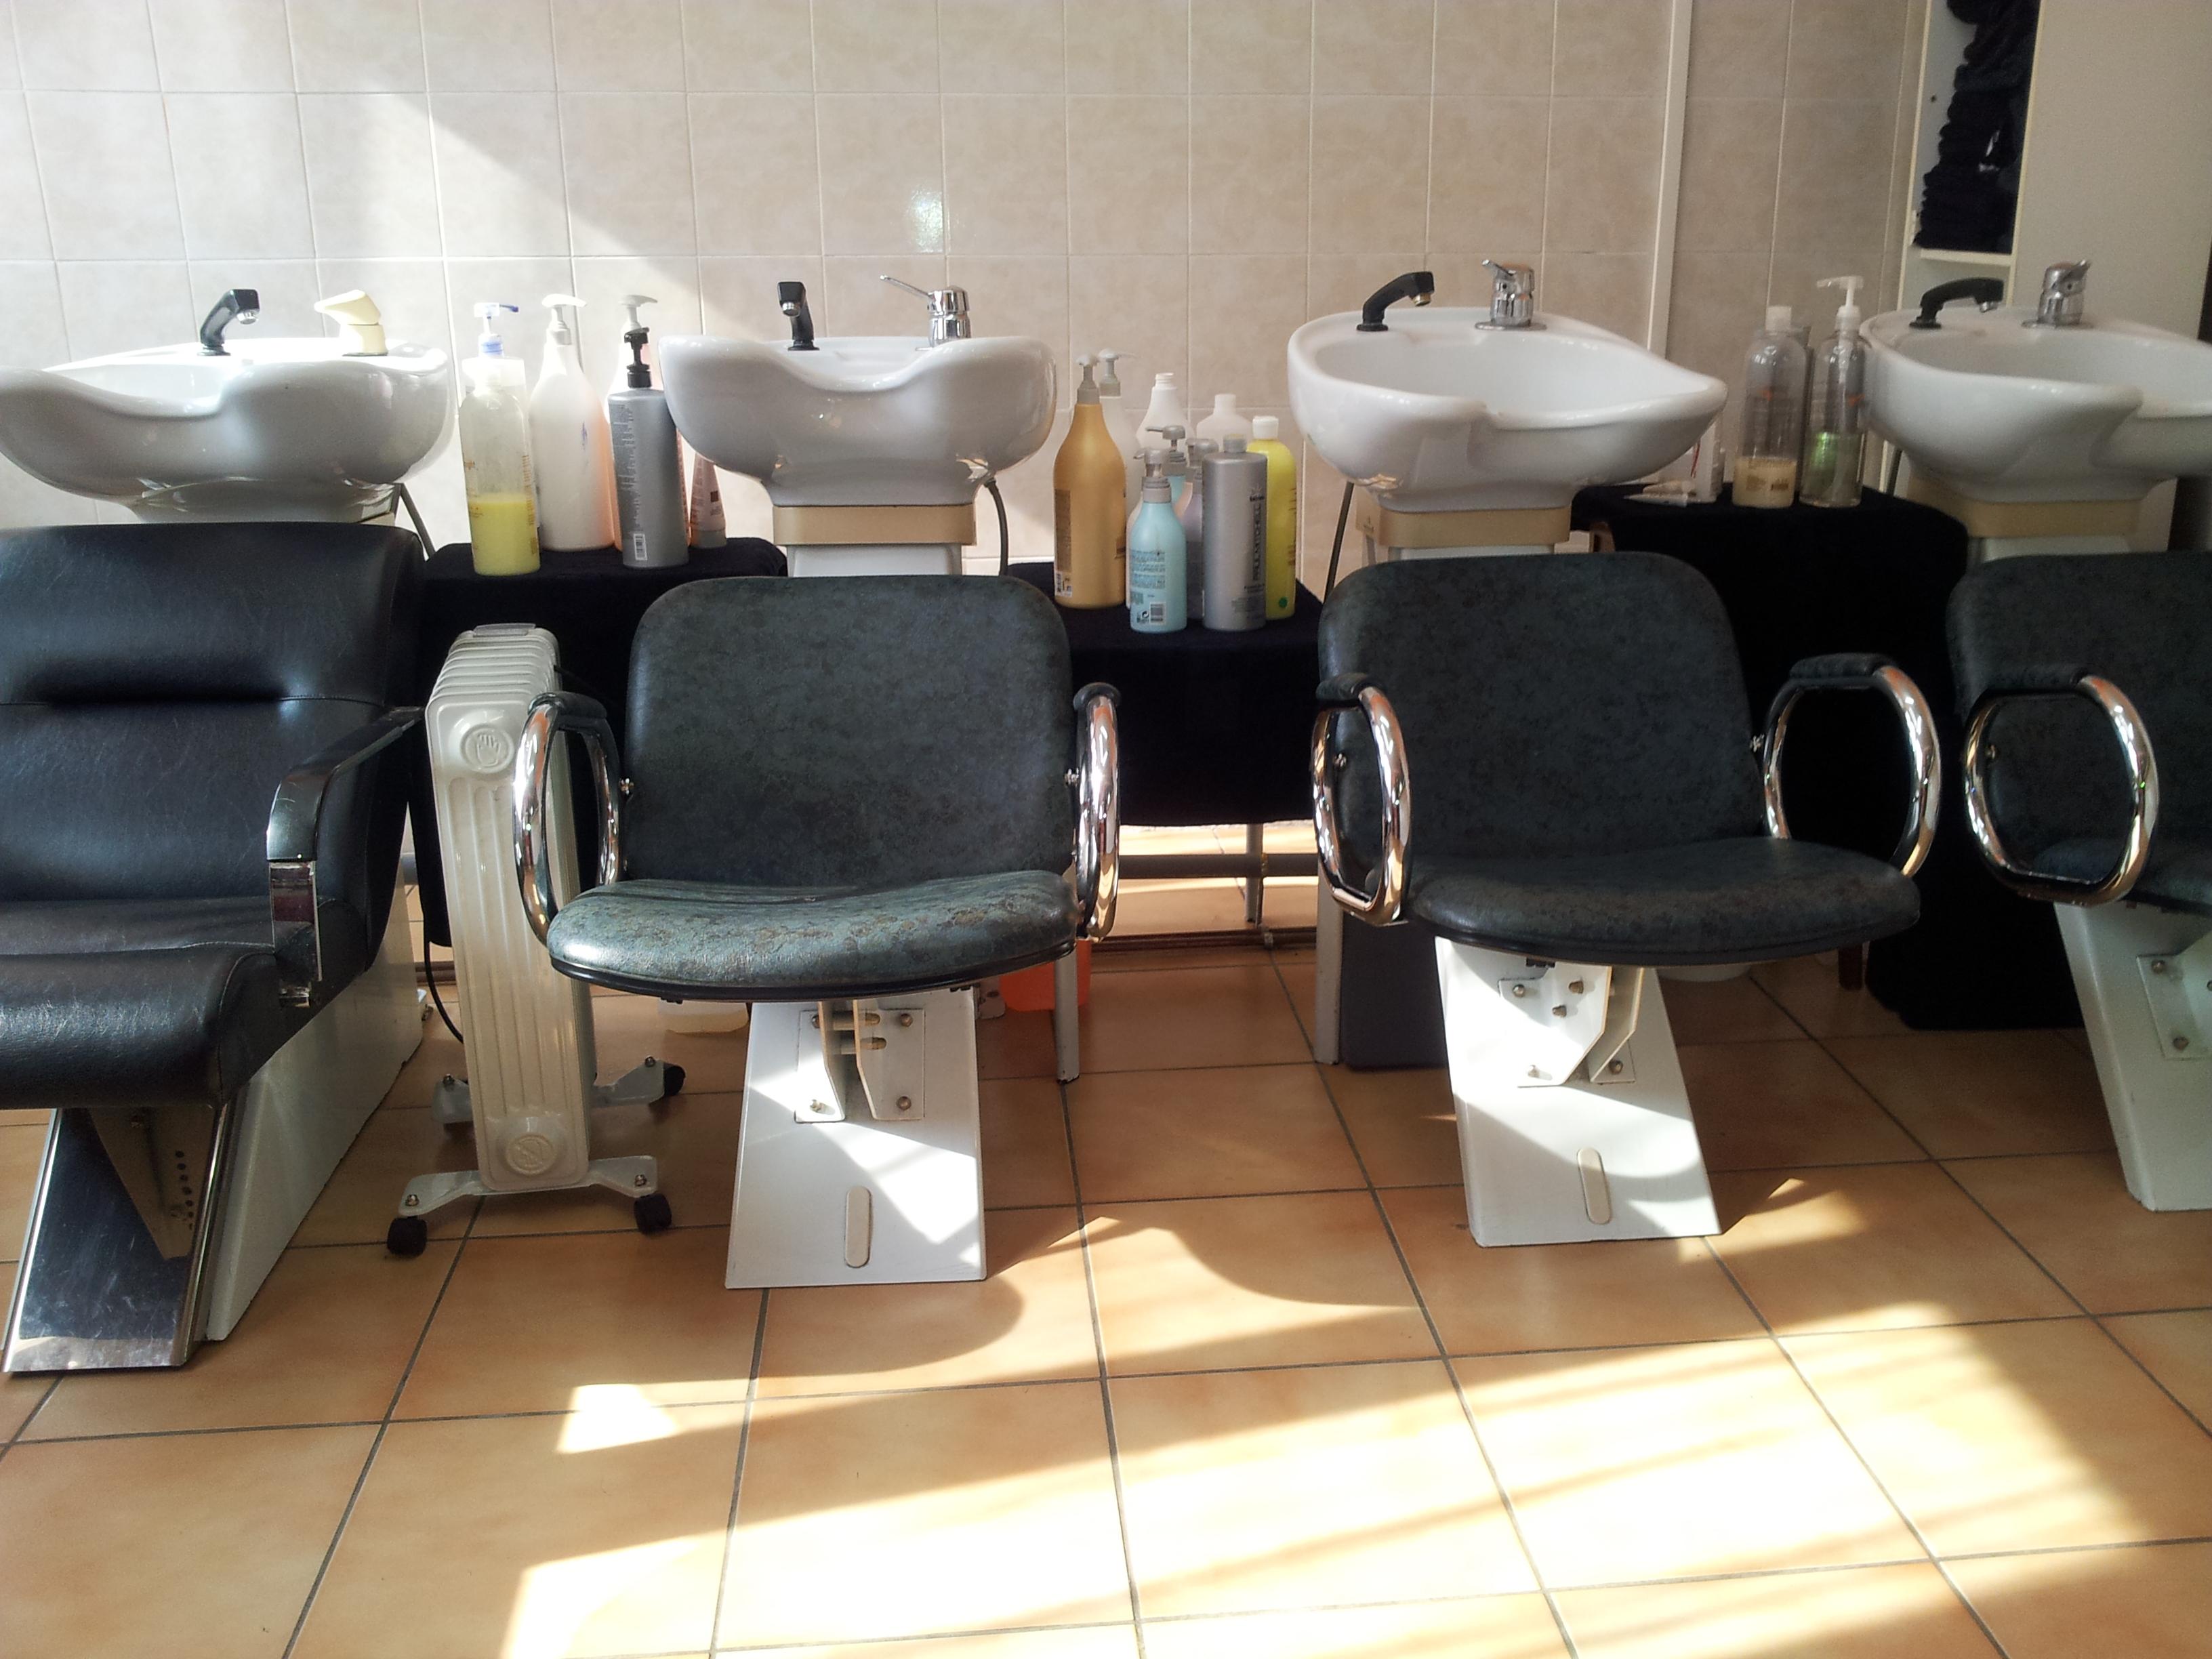 Salon de coiffure relooking chez nicole roubaix avis for Avis salon de coiffure